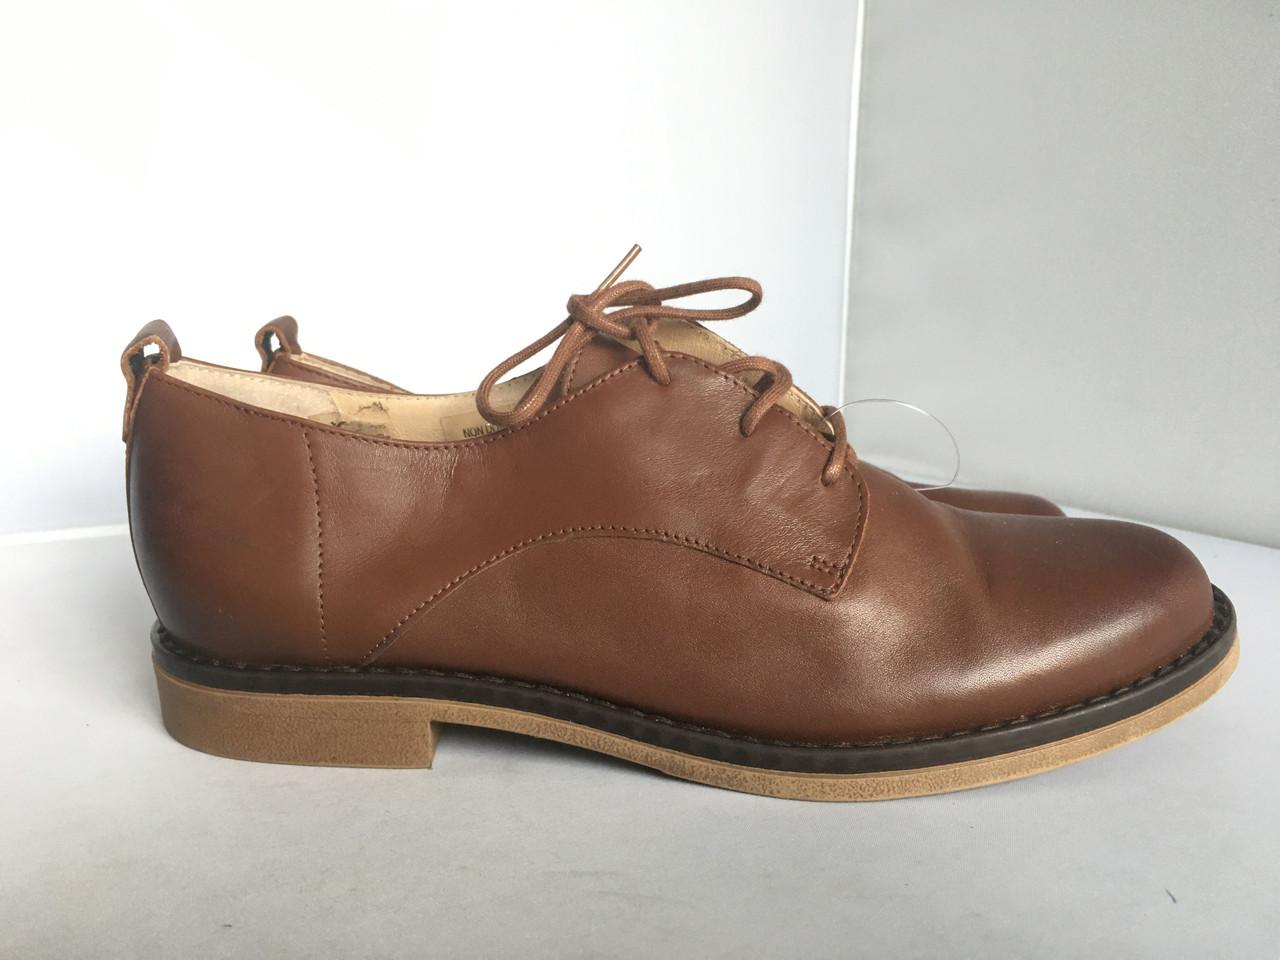 Женские туфли- броги San Marina, 38 размер